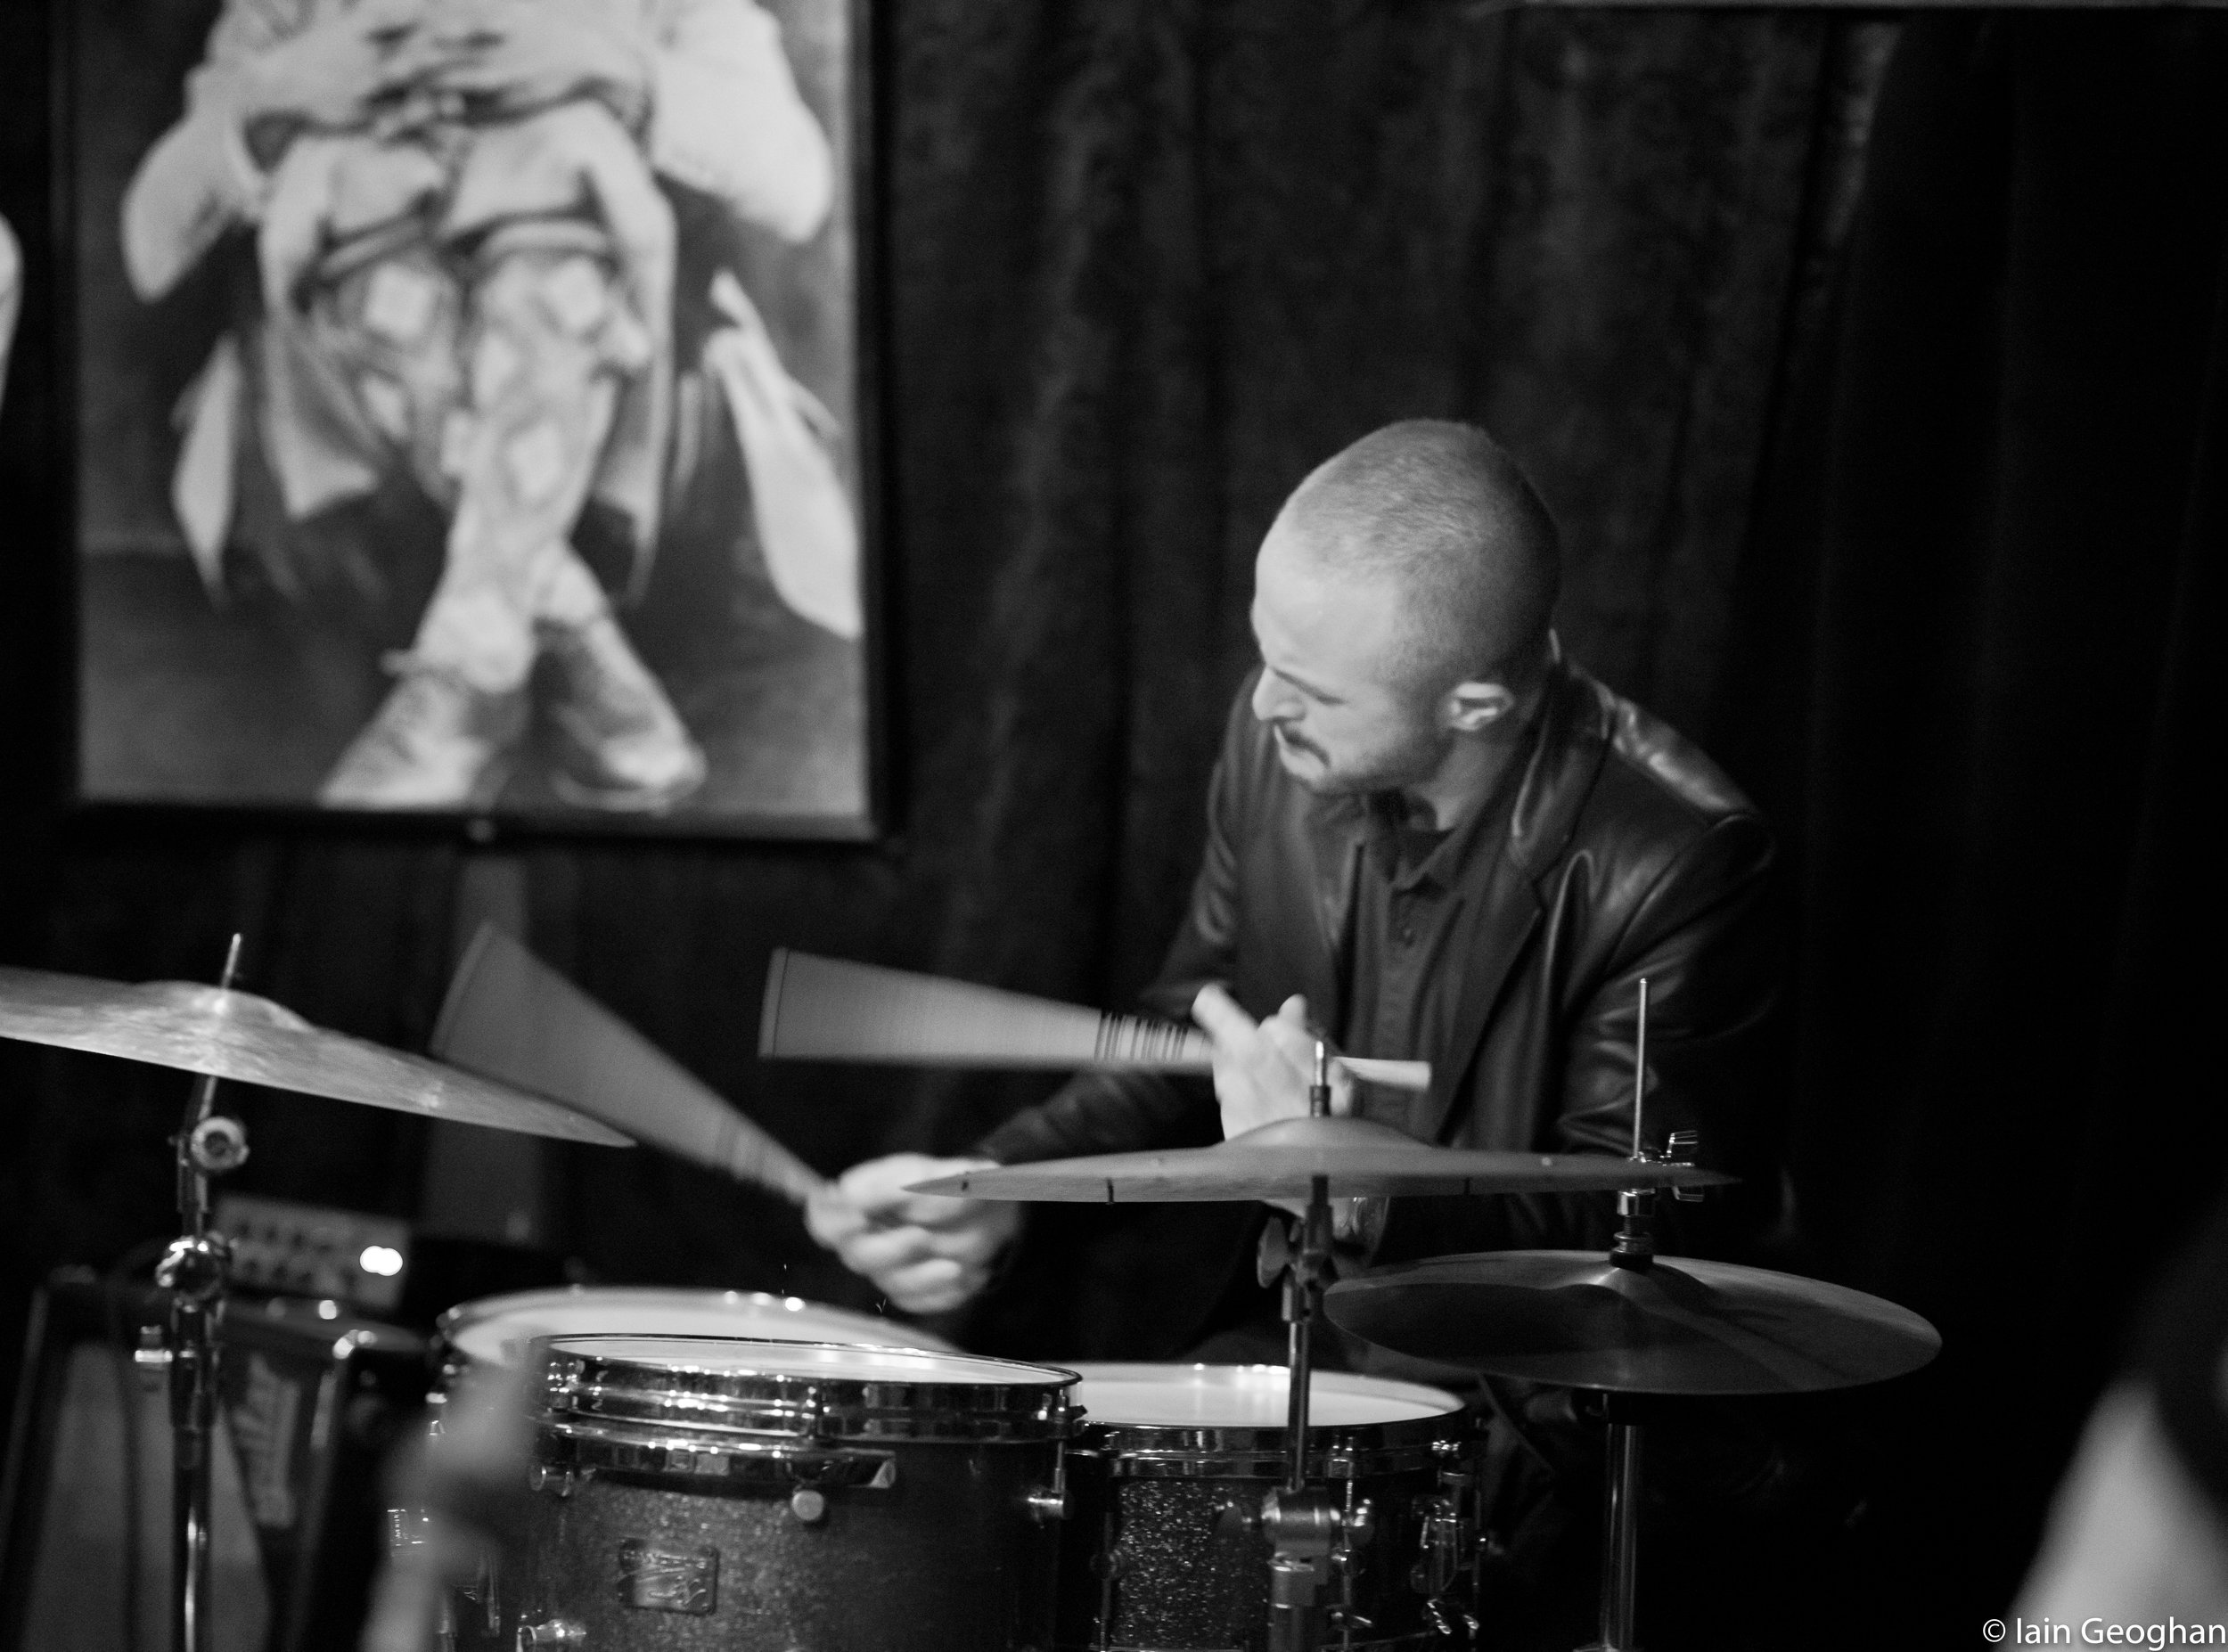 homie Alon_sma3  drummer Alon not bass Alon.jpg